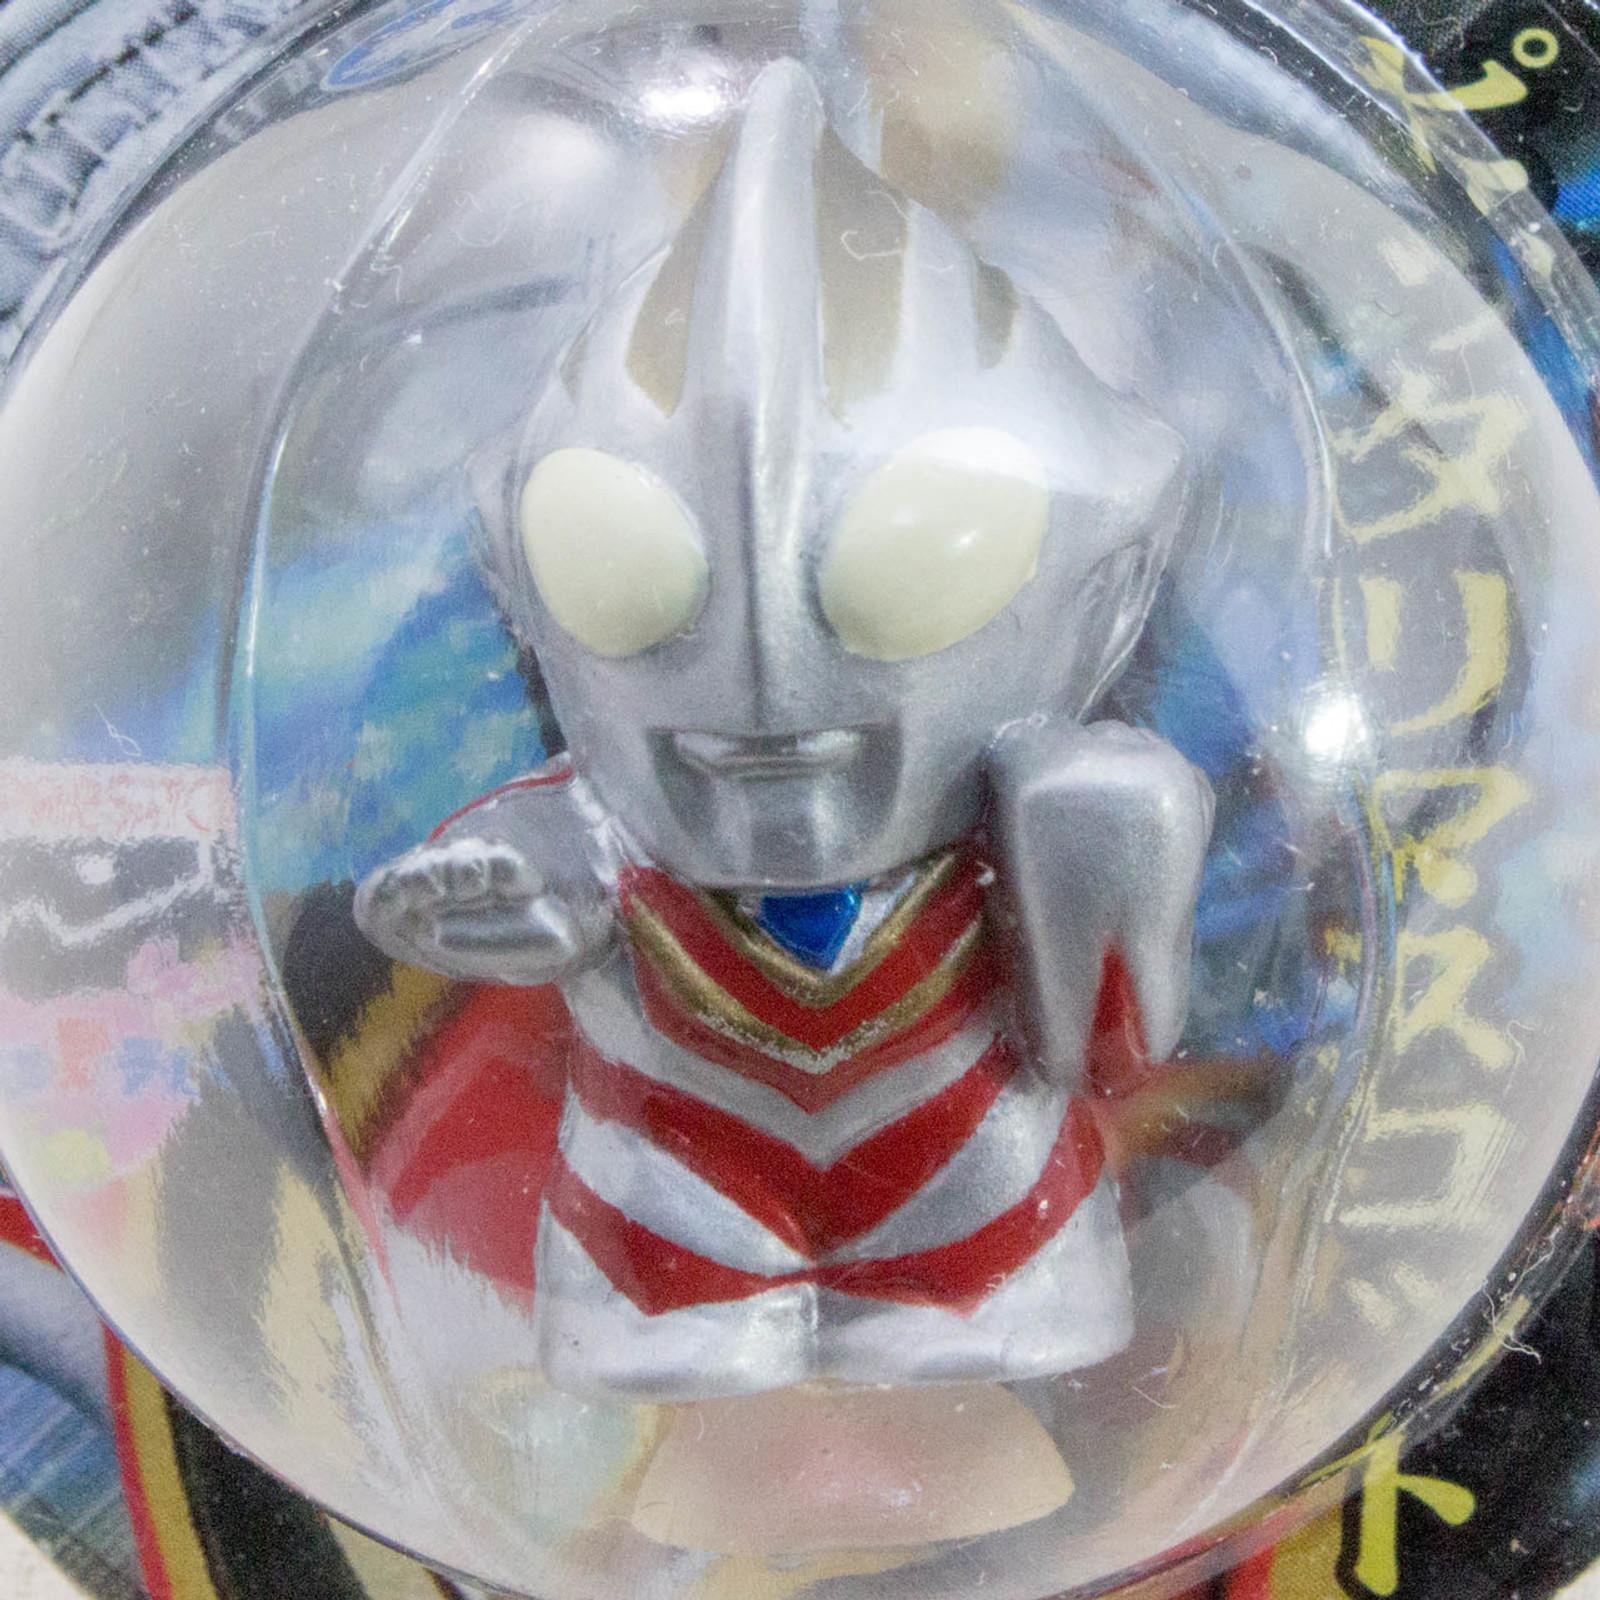 "Ultraman Gaia 1.2"" Mini Figure with Sucker Tsuburaya JAPAN TOKUSATSU ANIME"